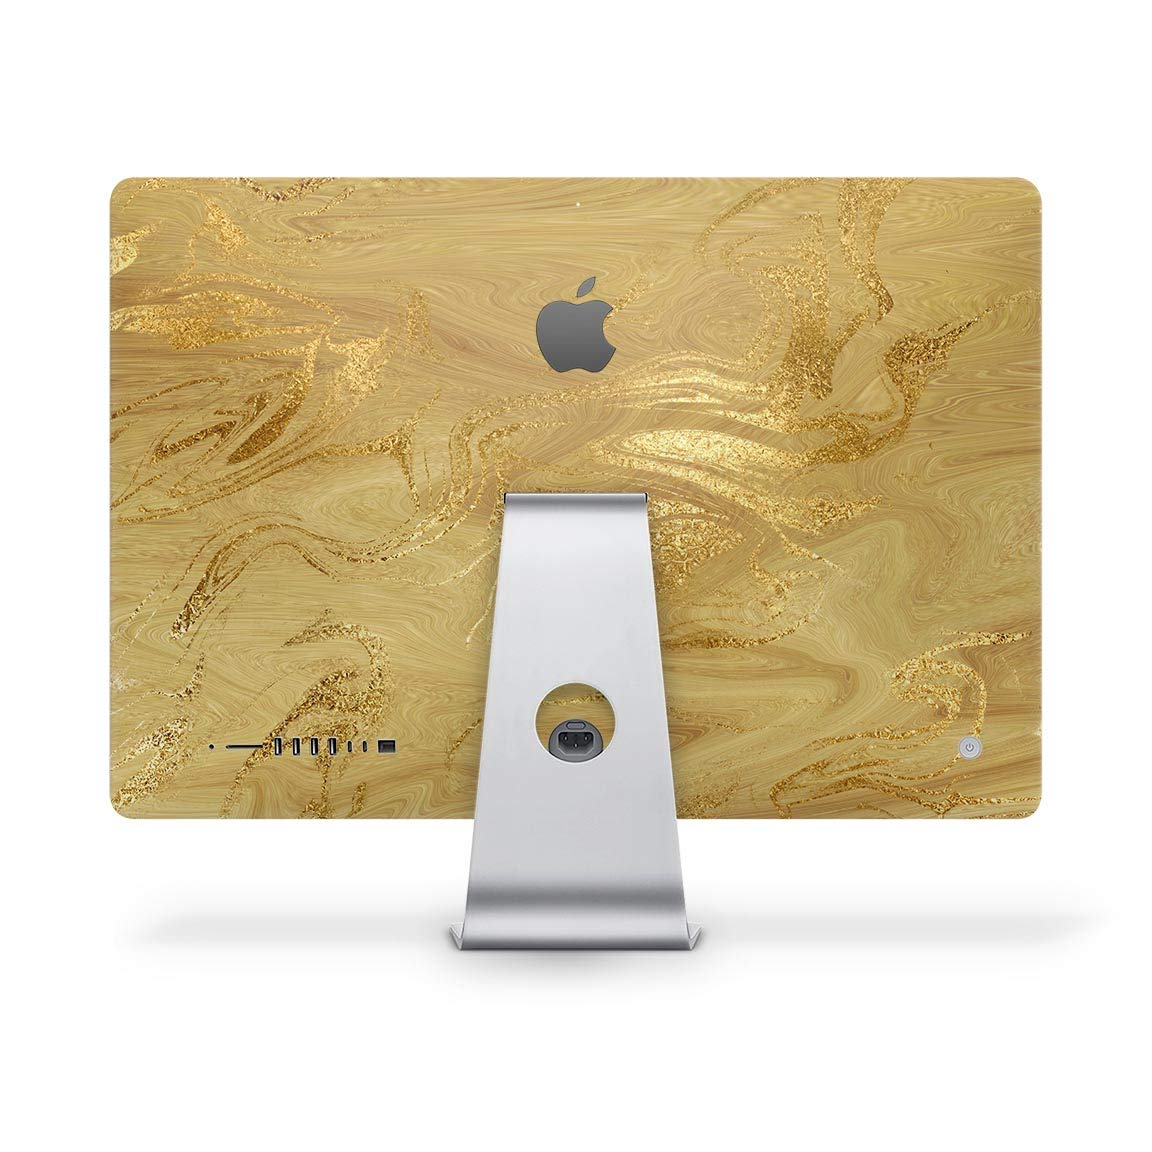 Molten ゴールドデジタルホイル スワール V5デザイン Skinz フルボディキット 27インチ iMac 5k A1419 デスクトップコンピュータモニターケース&スタンド用 - プレミアム3Mビニールデカールラップカバー   B07P7MB3CV